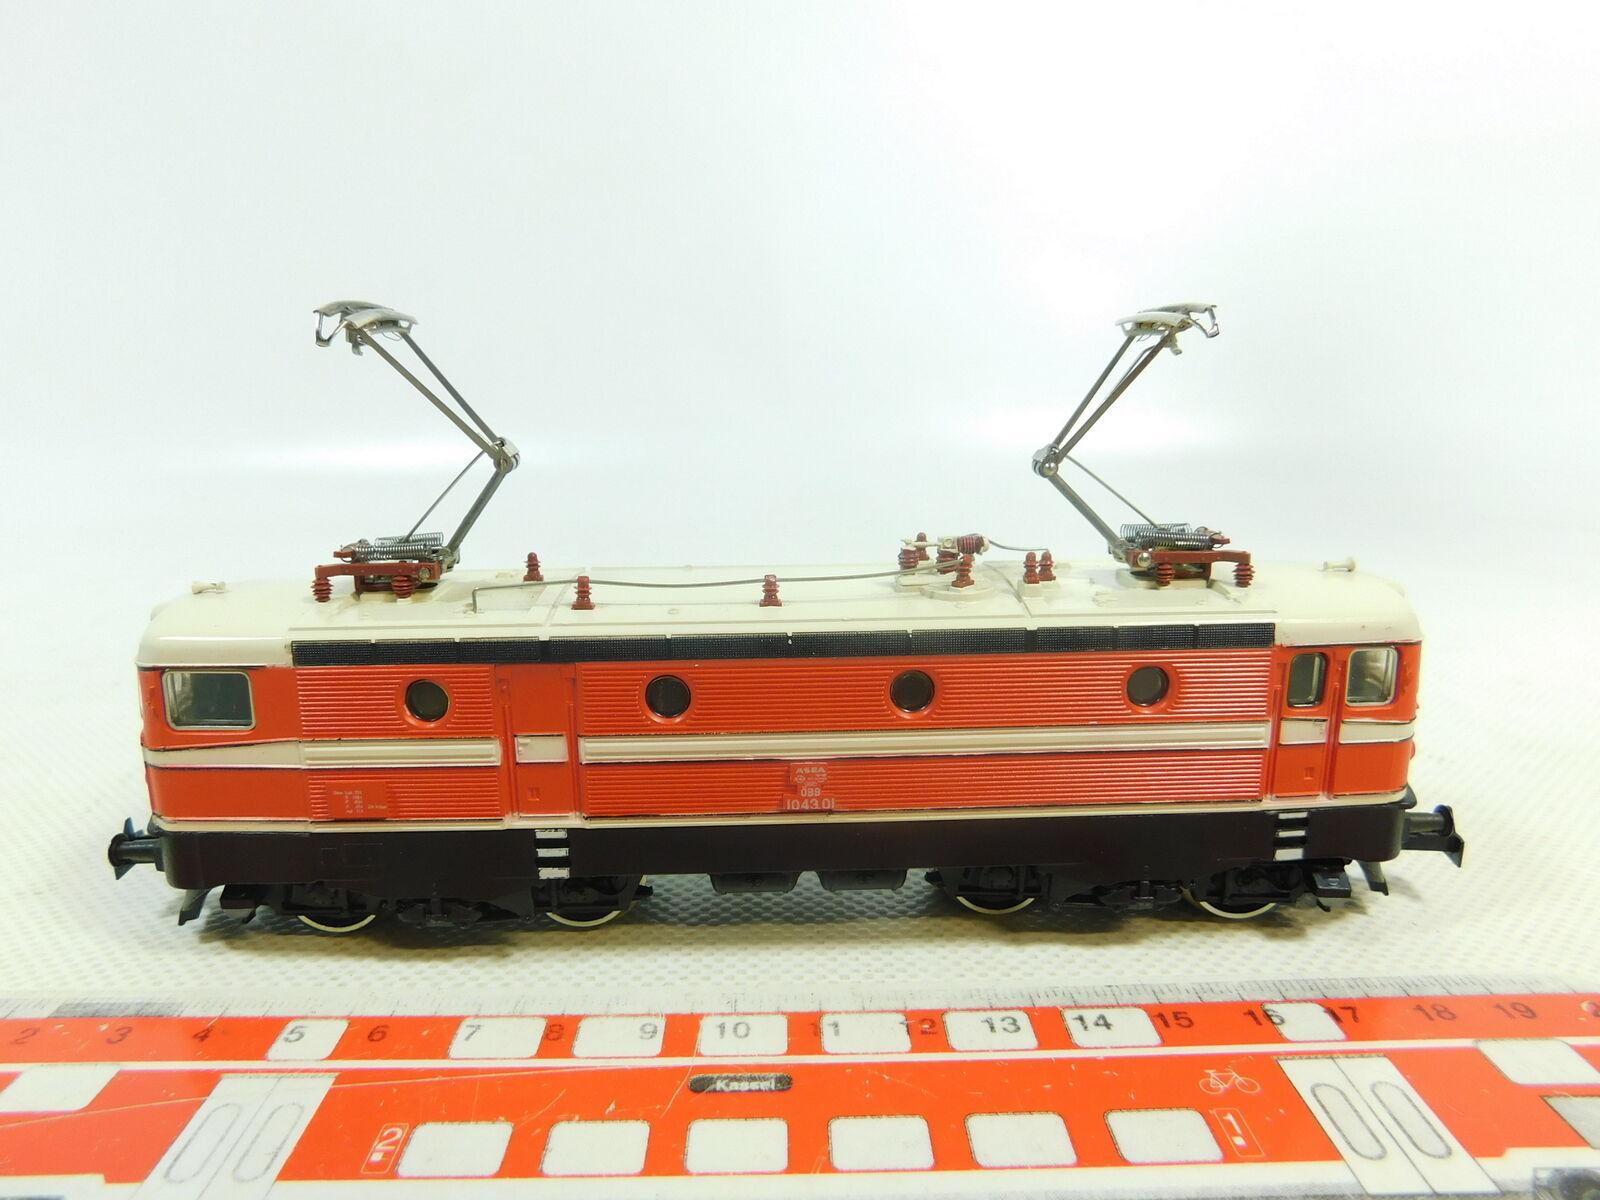 BT1-1Märklin H0 Ac Ac Ac 3041 Electric Locomotive E-Locomotive 1043.01 ÖBB,2. Choice 3f401a